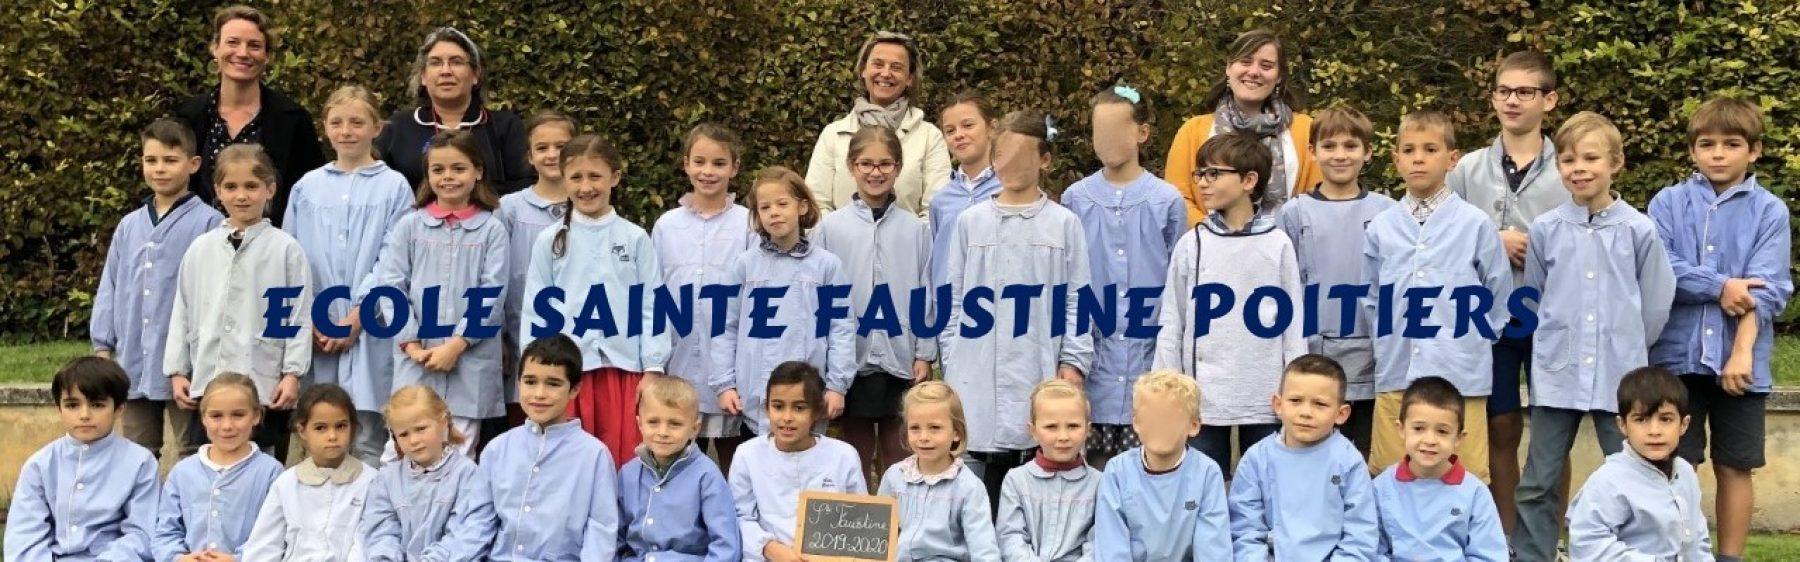 Ecole Sainte Faustine